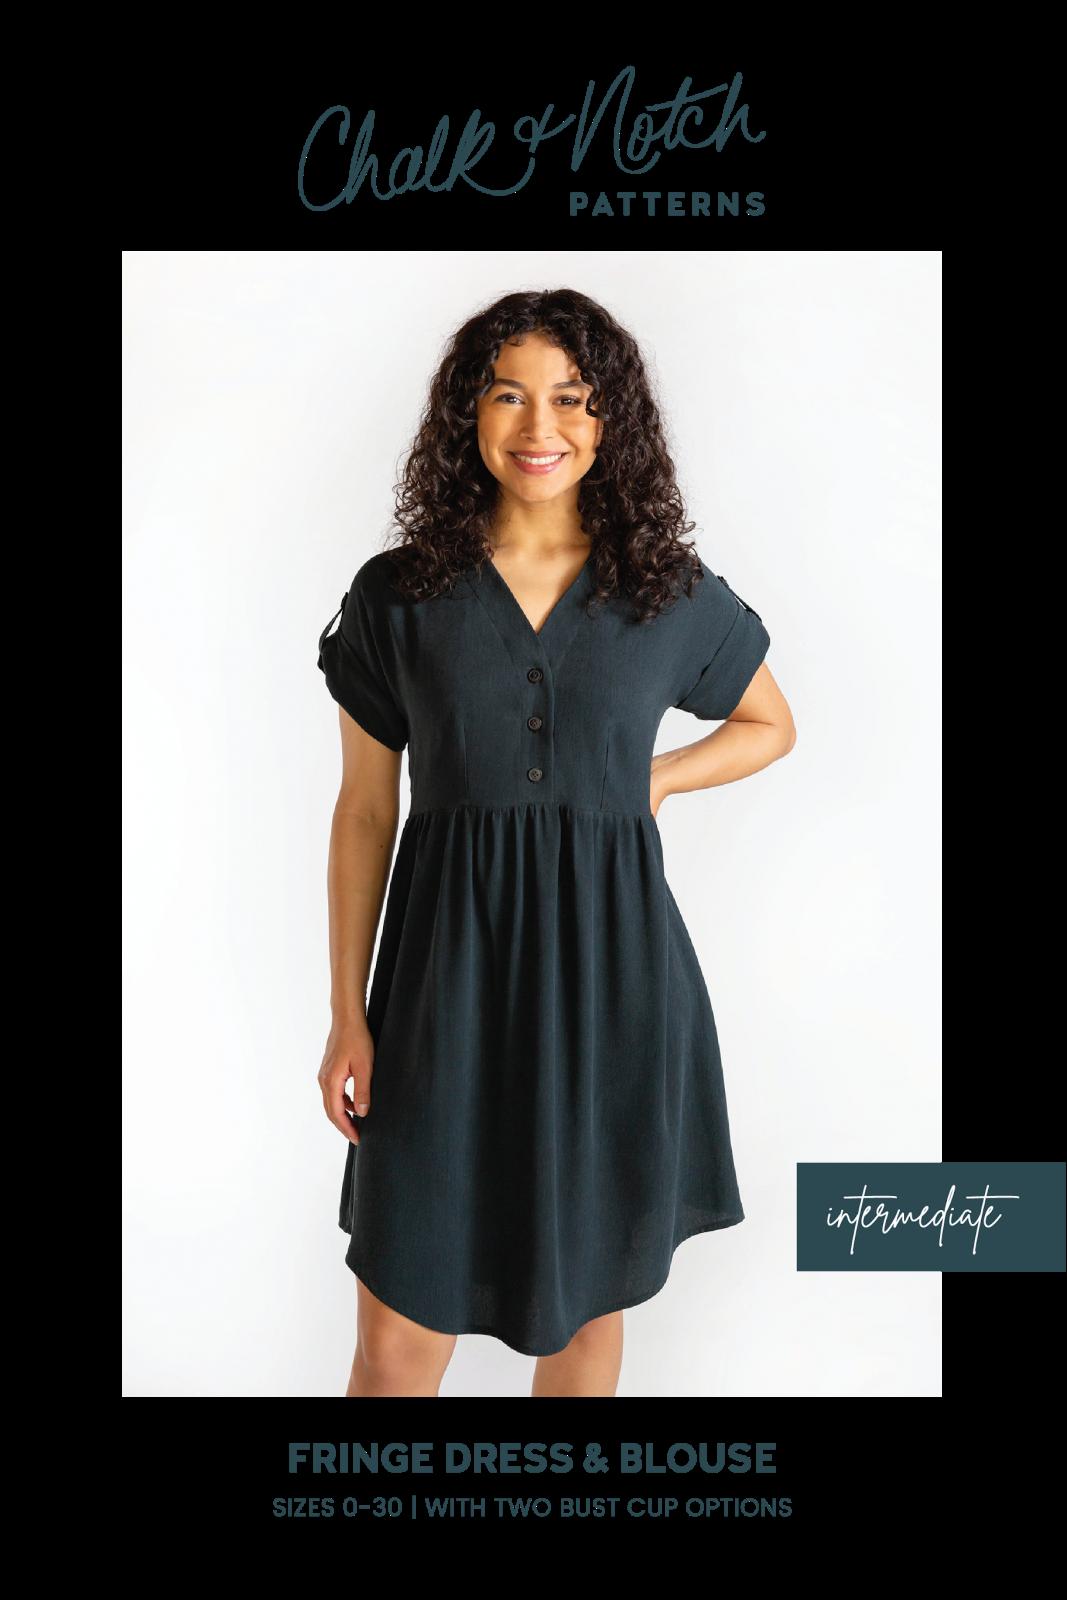 Chalk & Notch Patterns -  Fringe Dress and Blouse